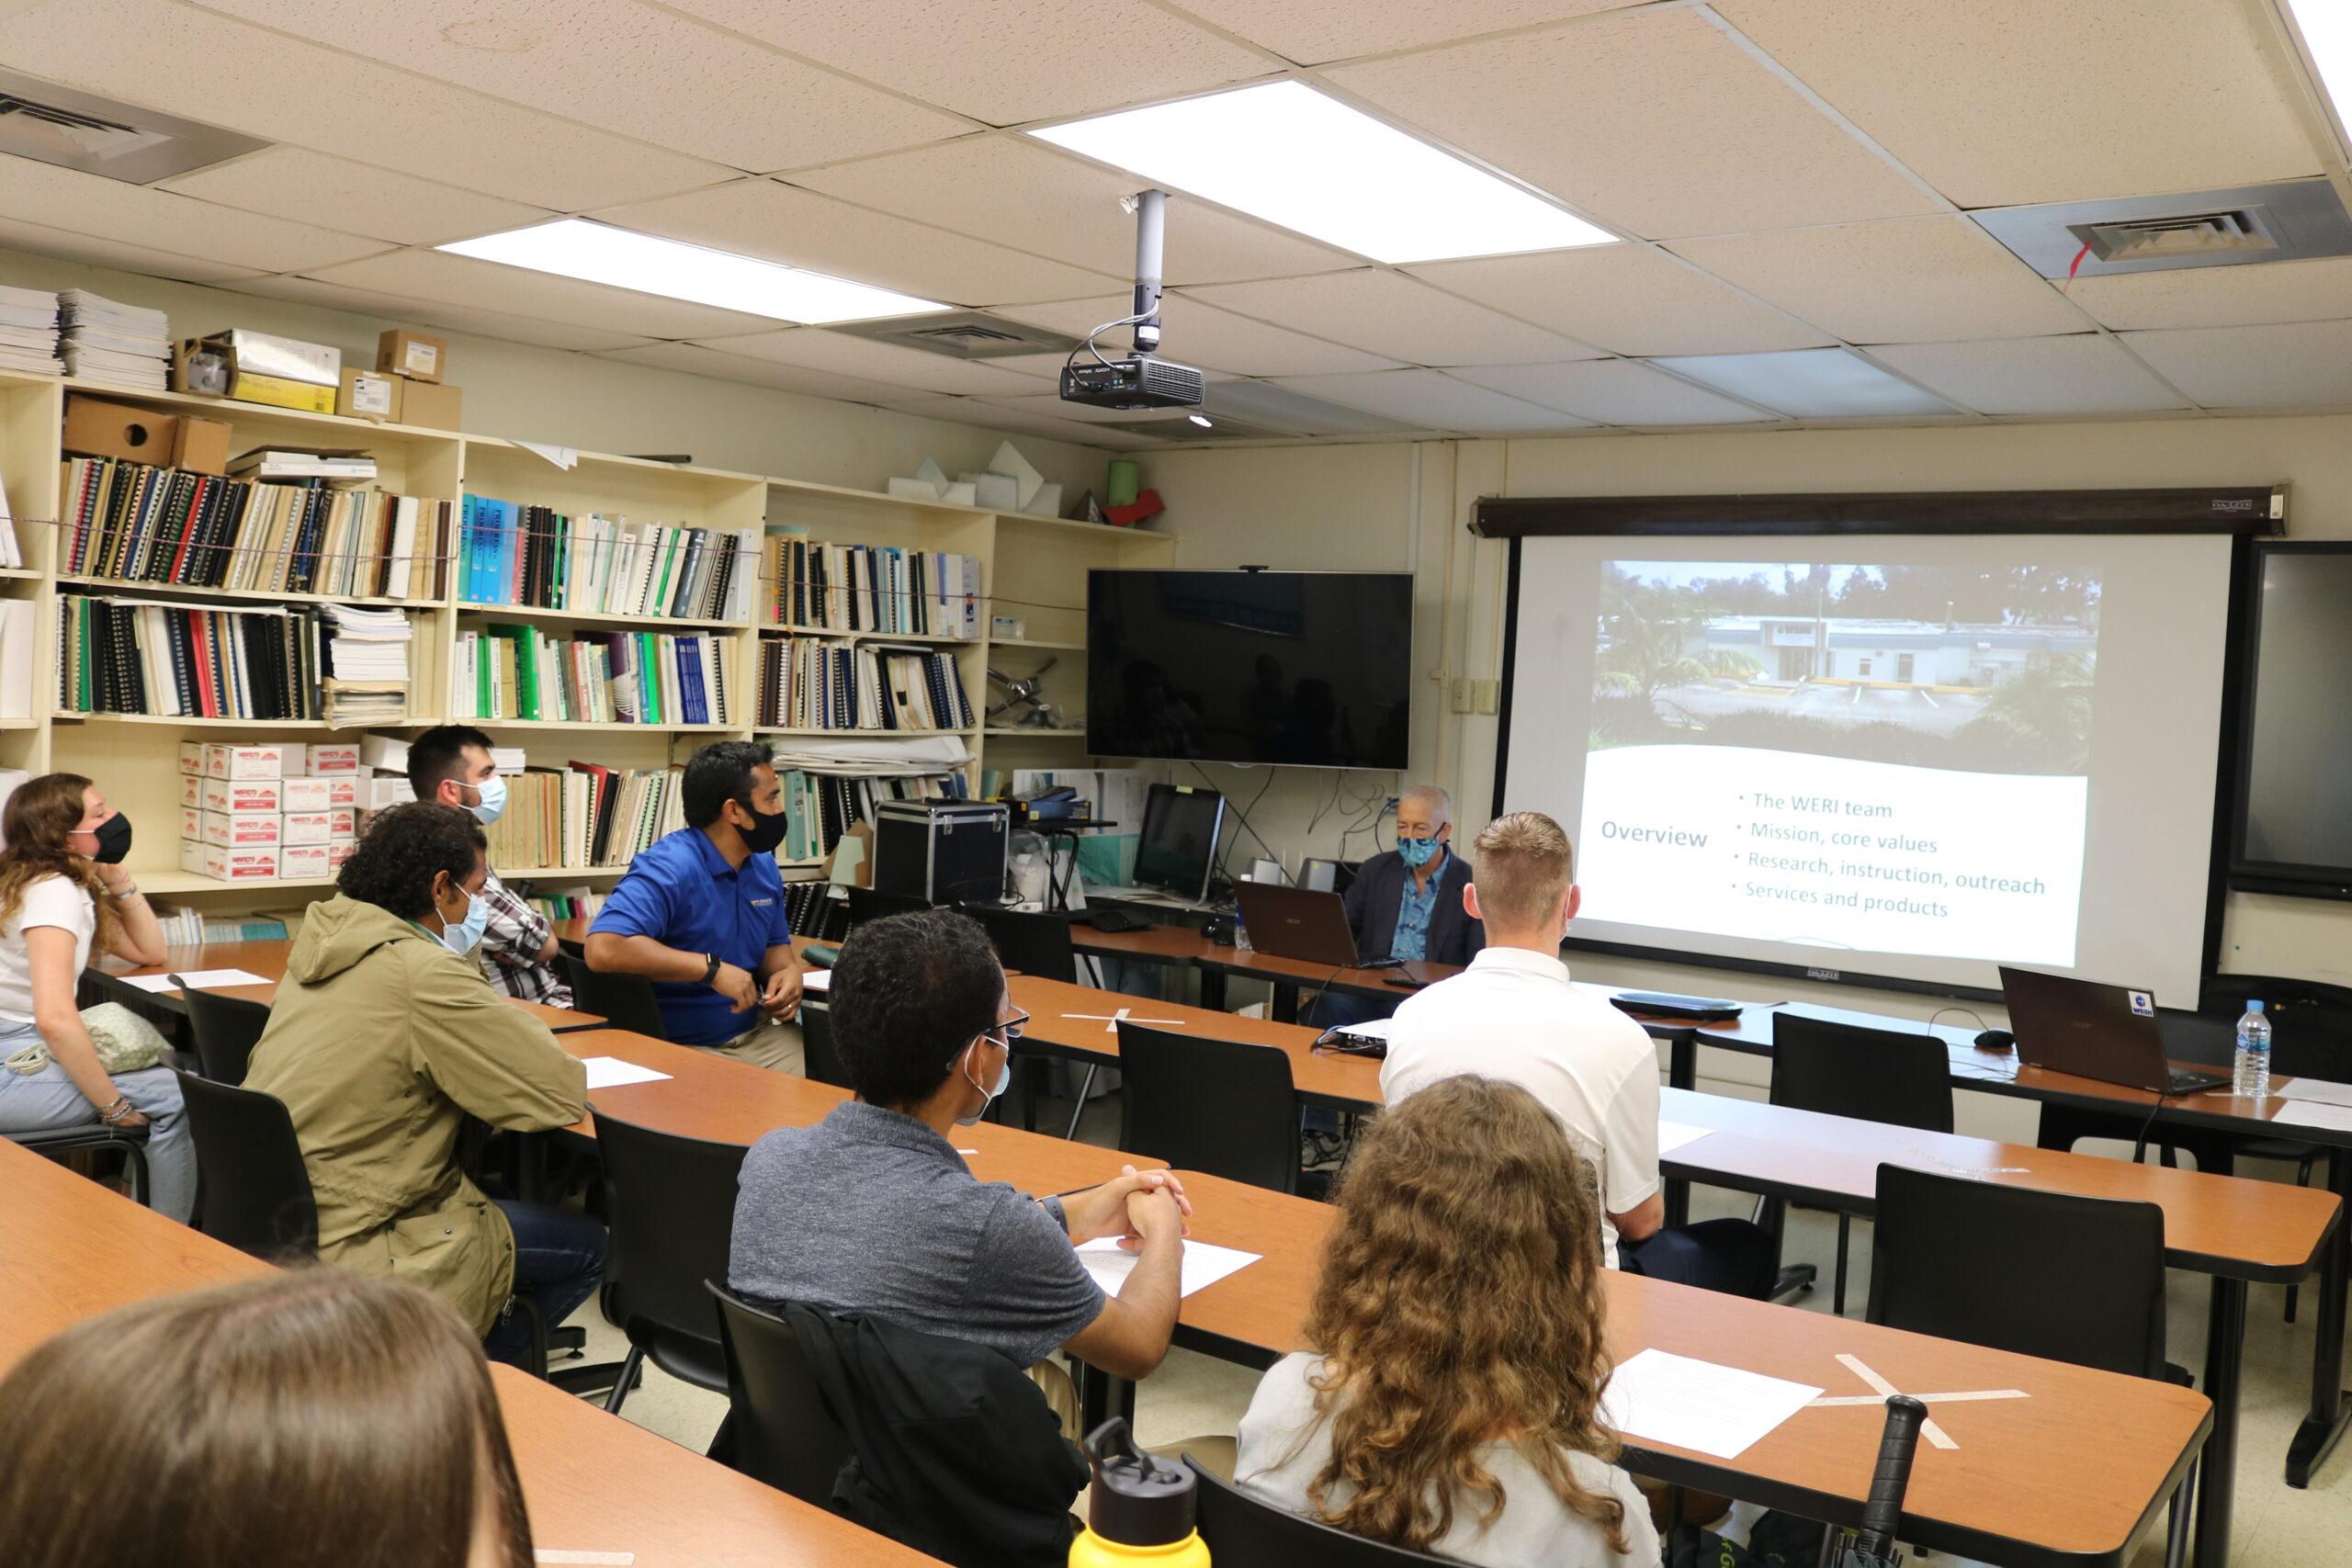 University of Pittsburg students visit WERI